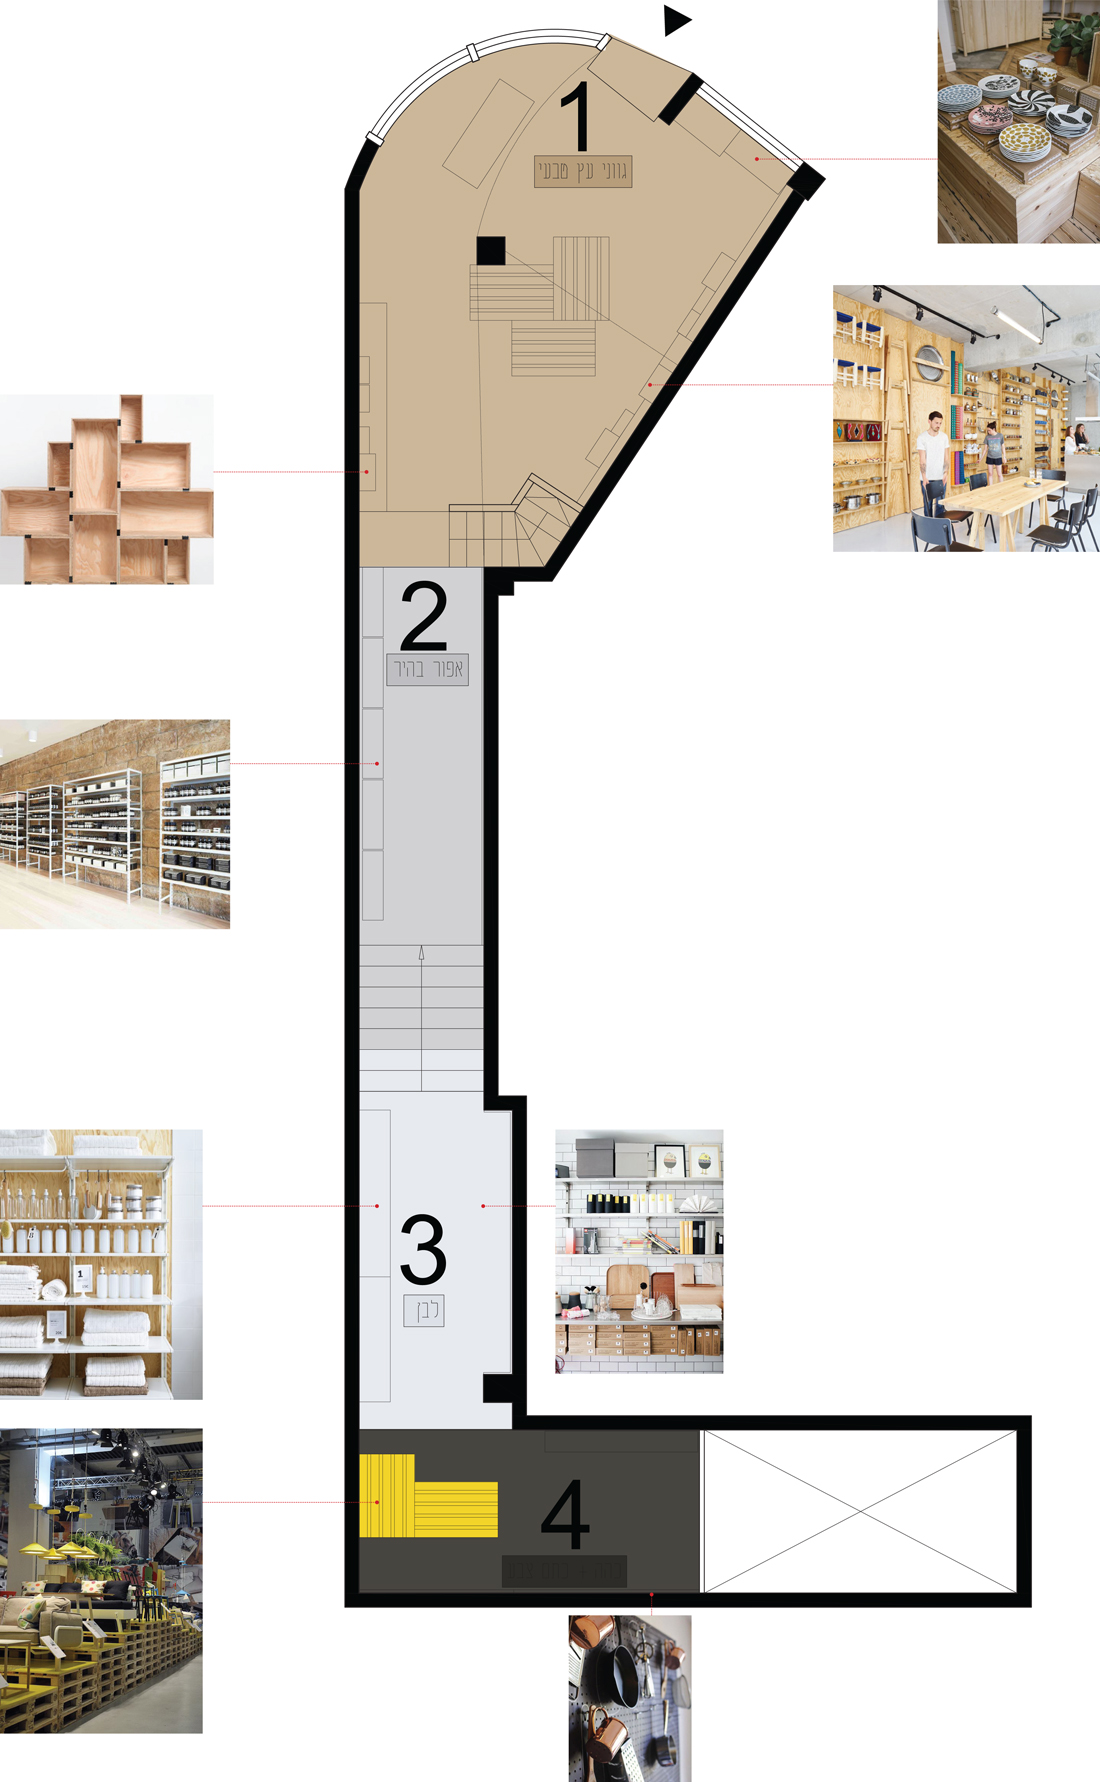 store plan